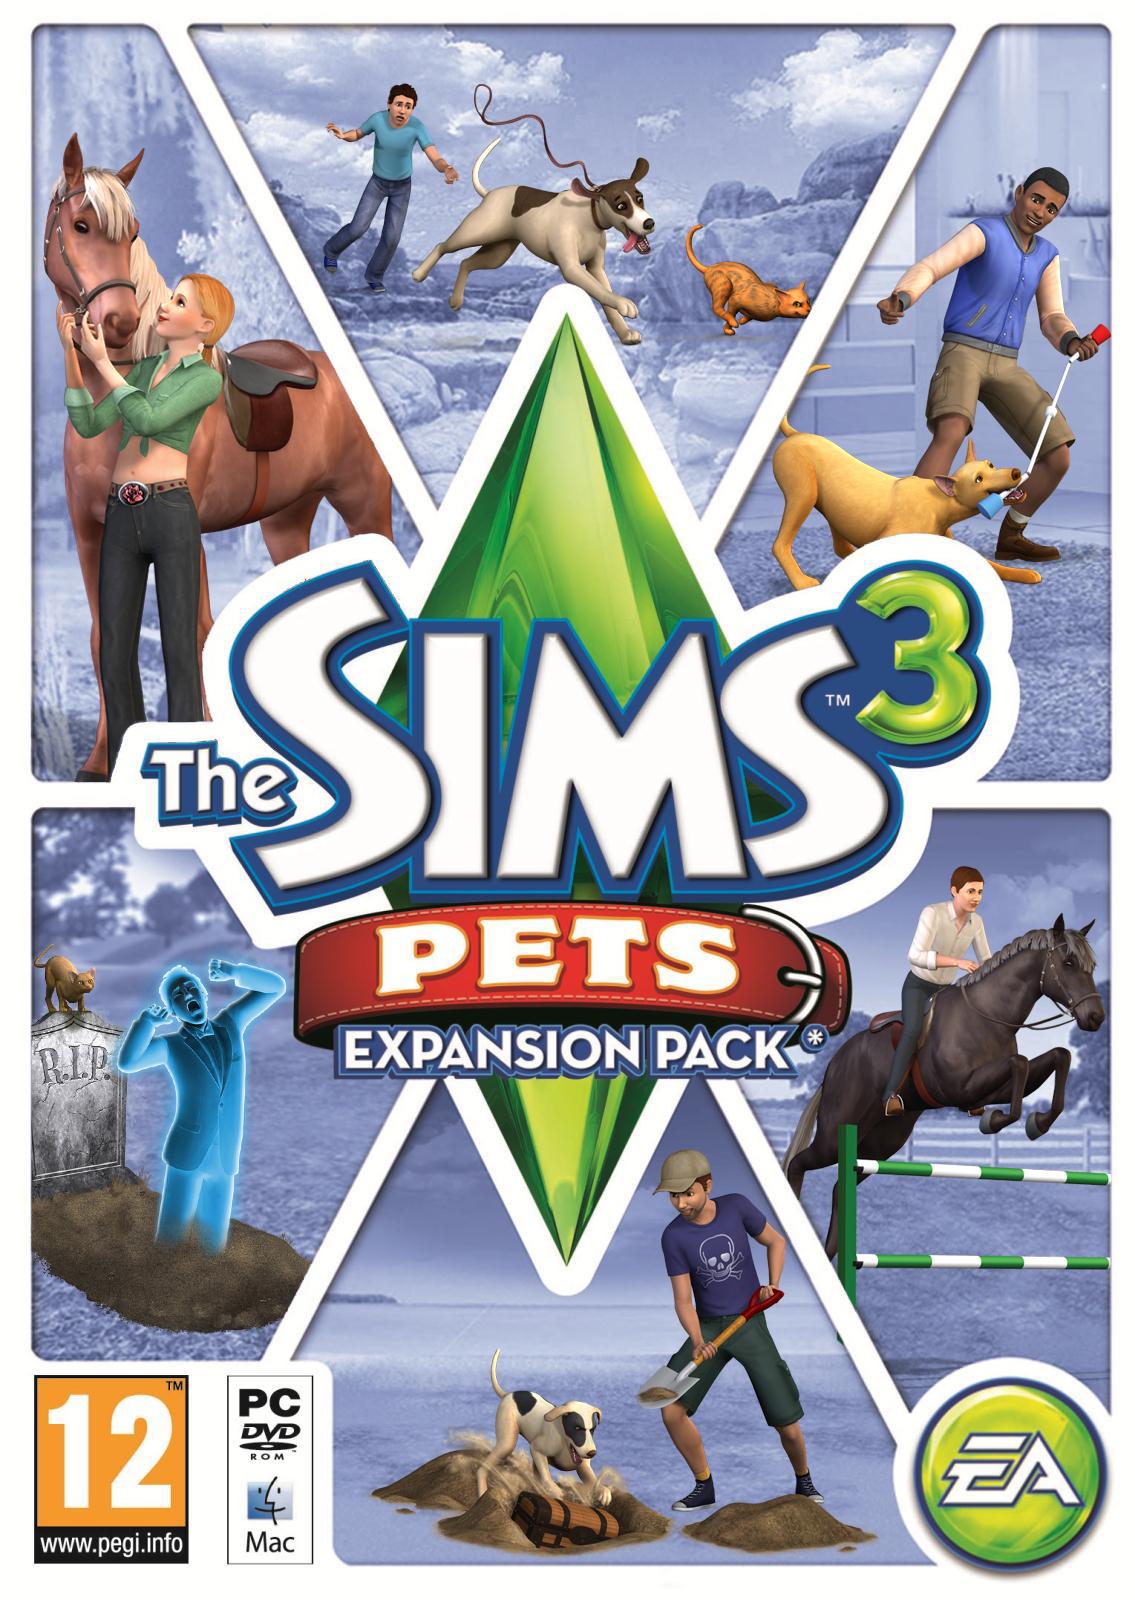 The sims 3 pets код активации - aa0